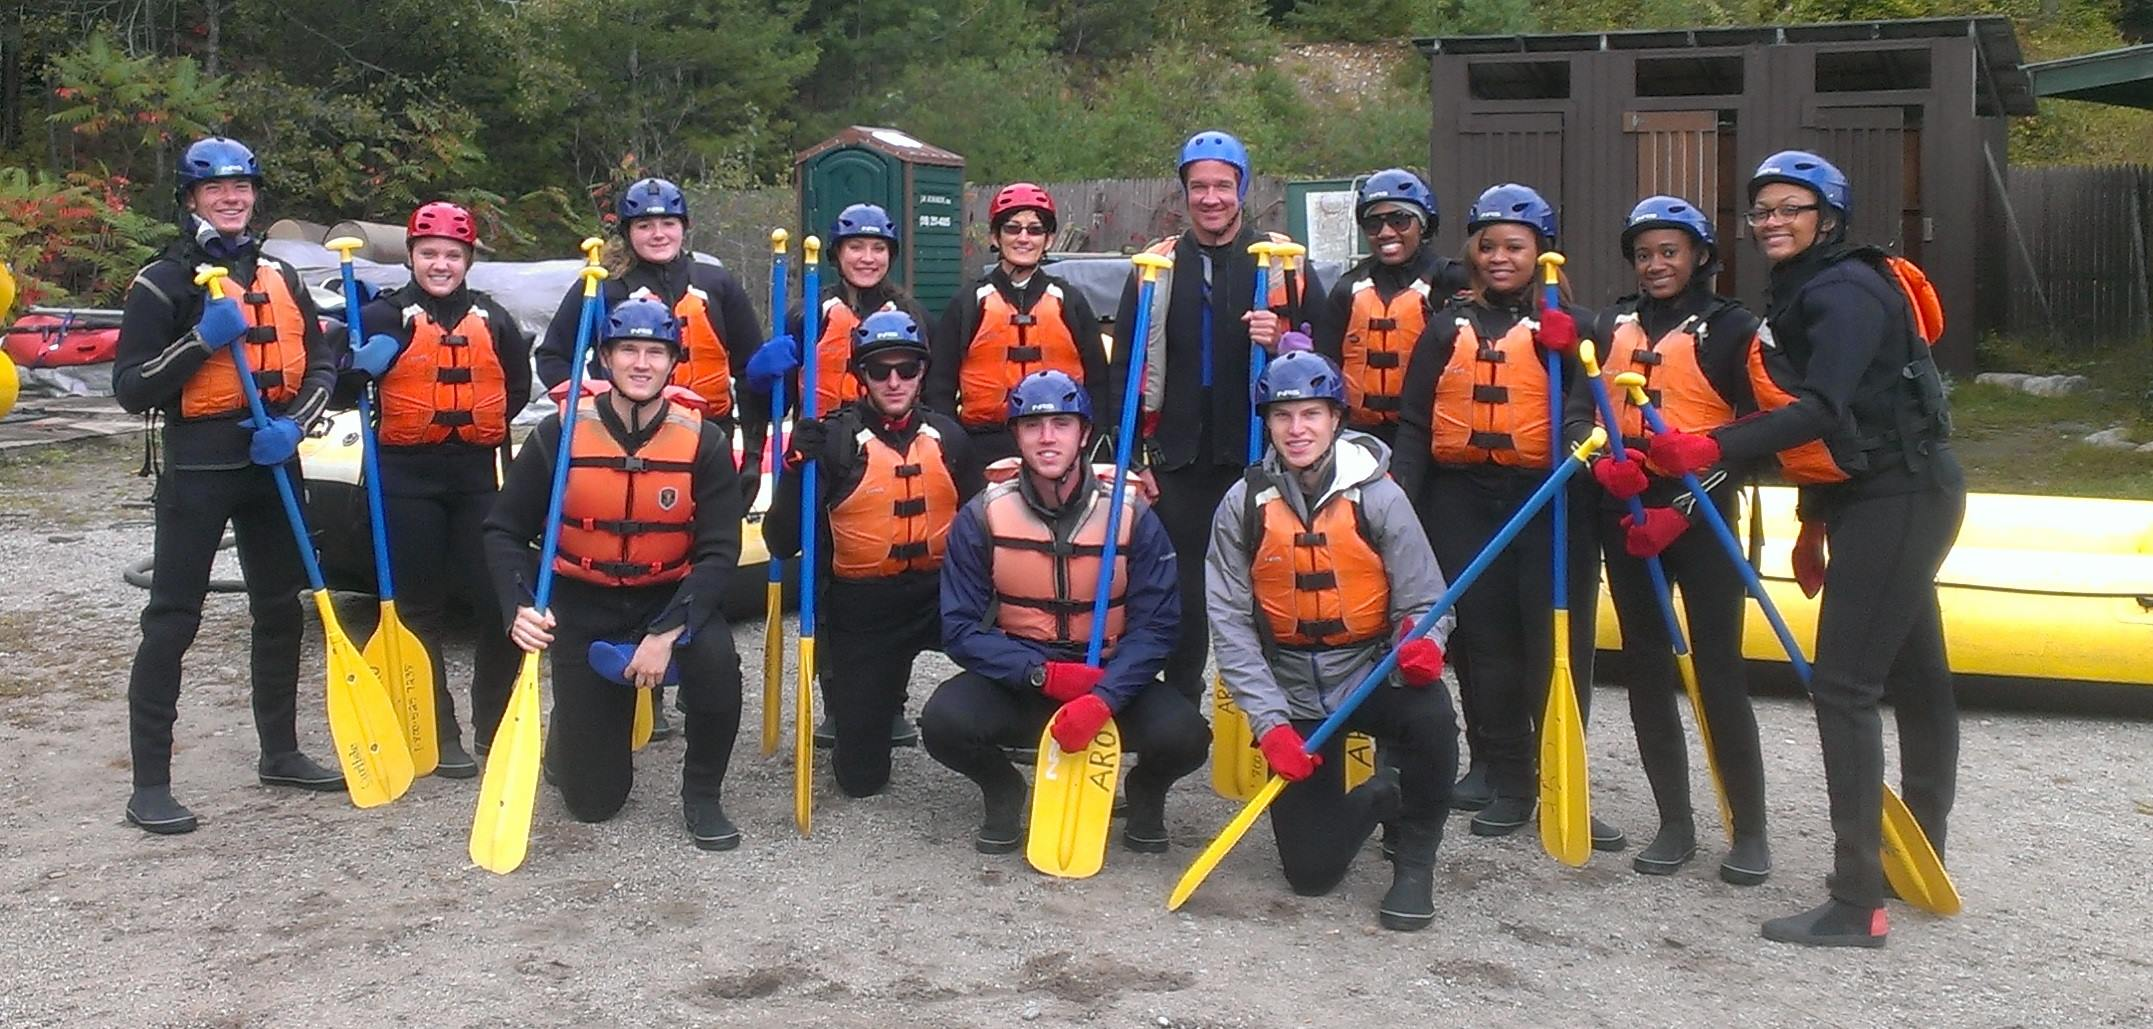 Whitewater rafting with UBalance